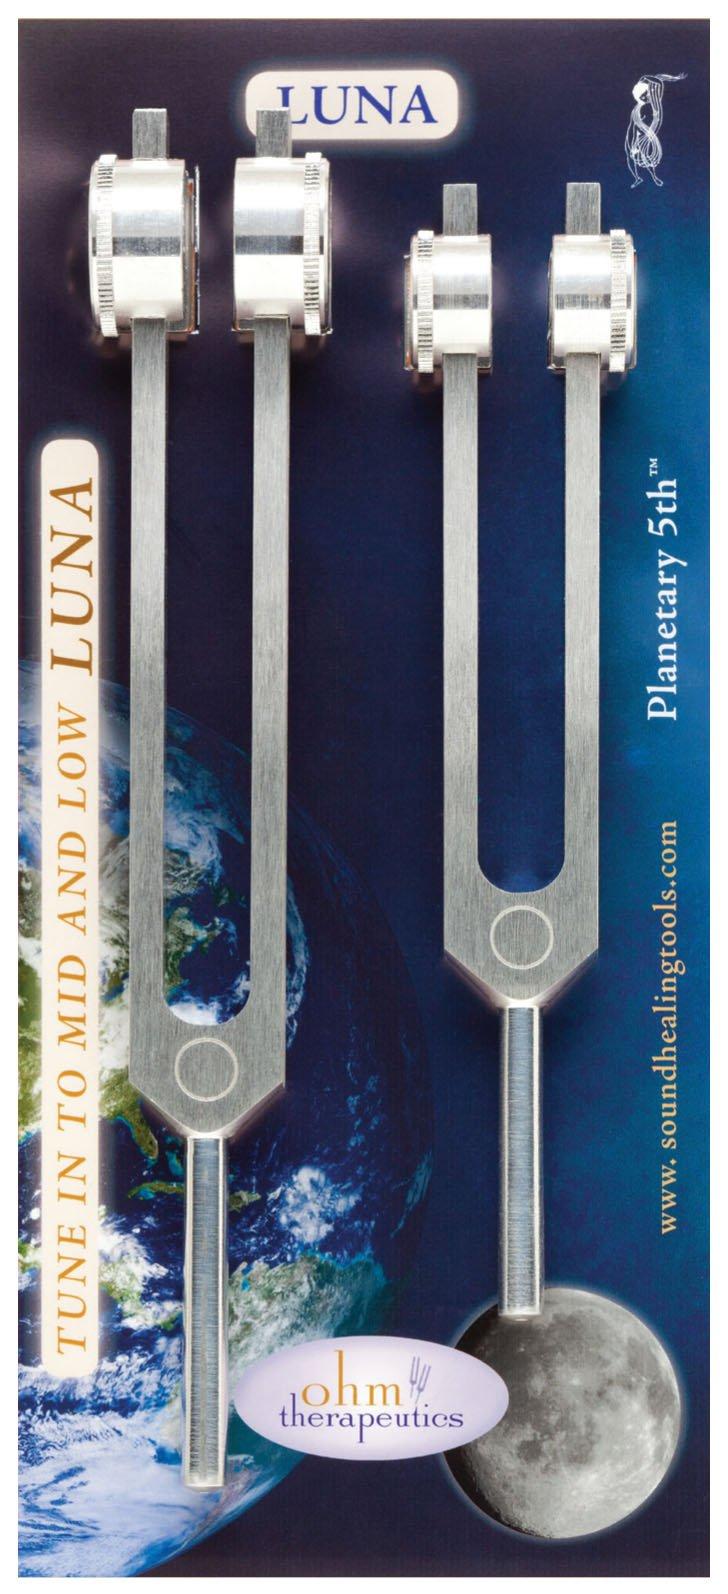 Tuning Fork - Luna Set - 210.42 & 105.21 hz